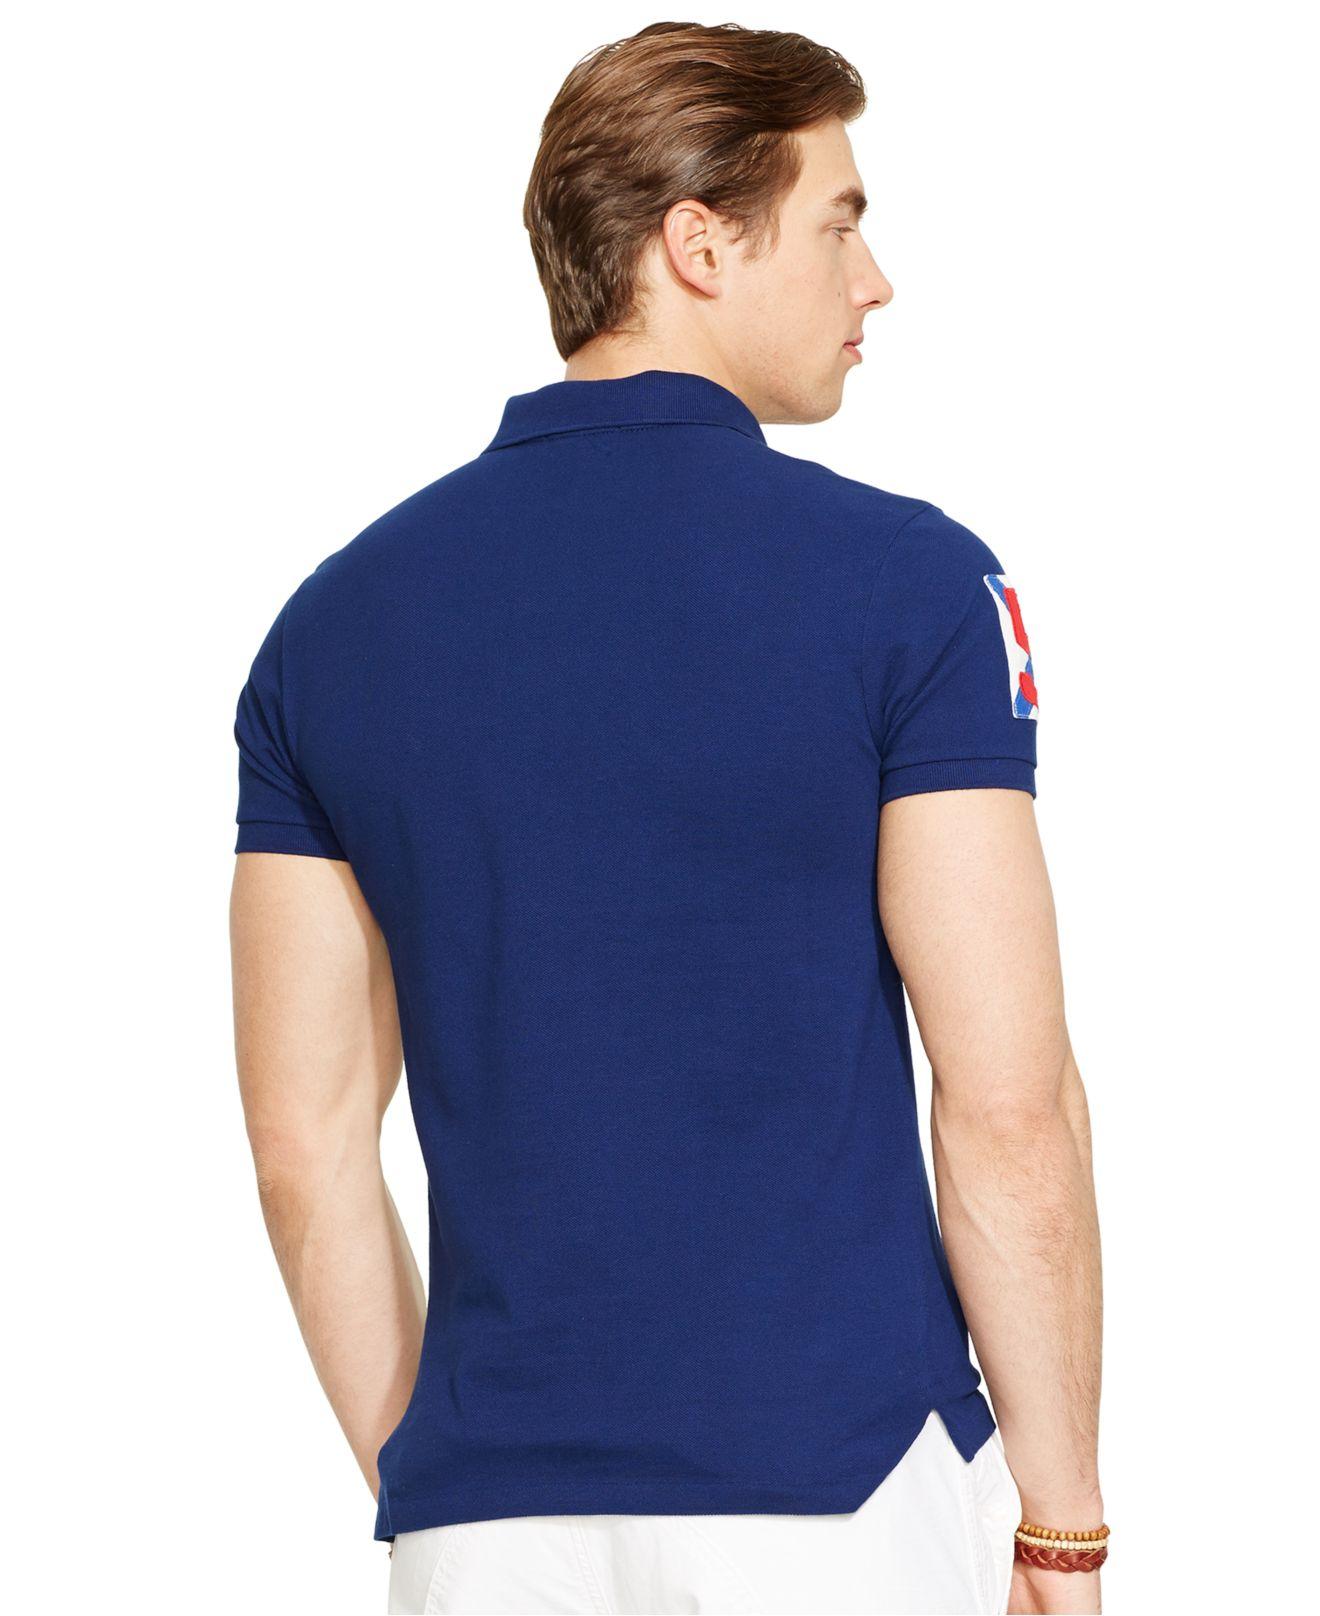 Polo ralph lauren custom fit yacht club mesh polo in blue for Ralph lauren polo club shirts